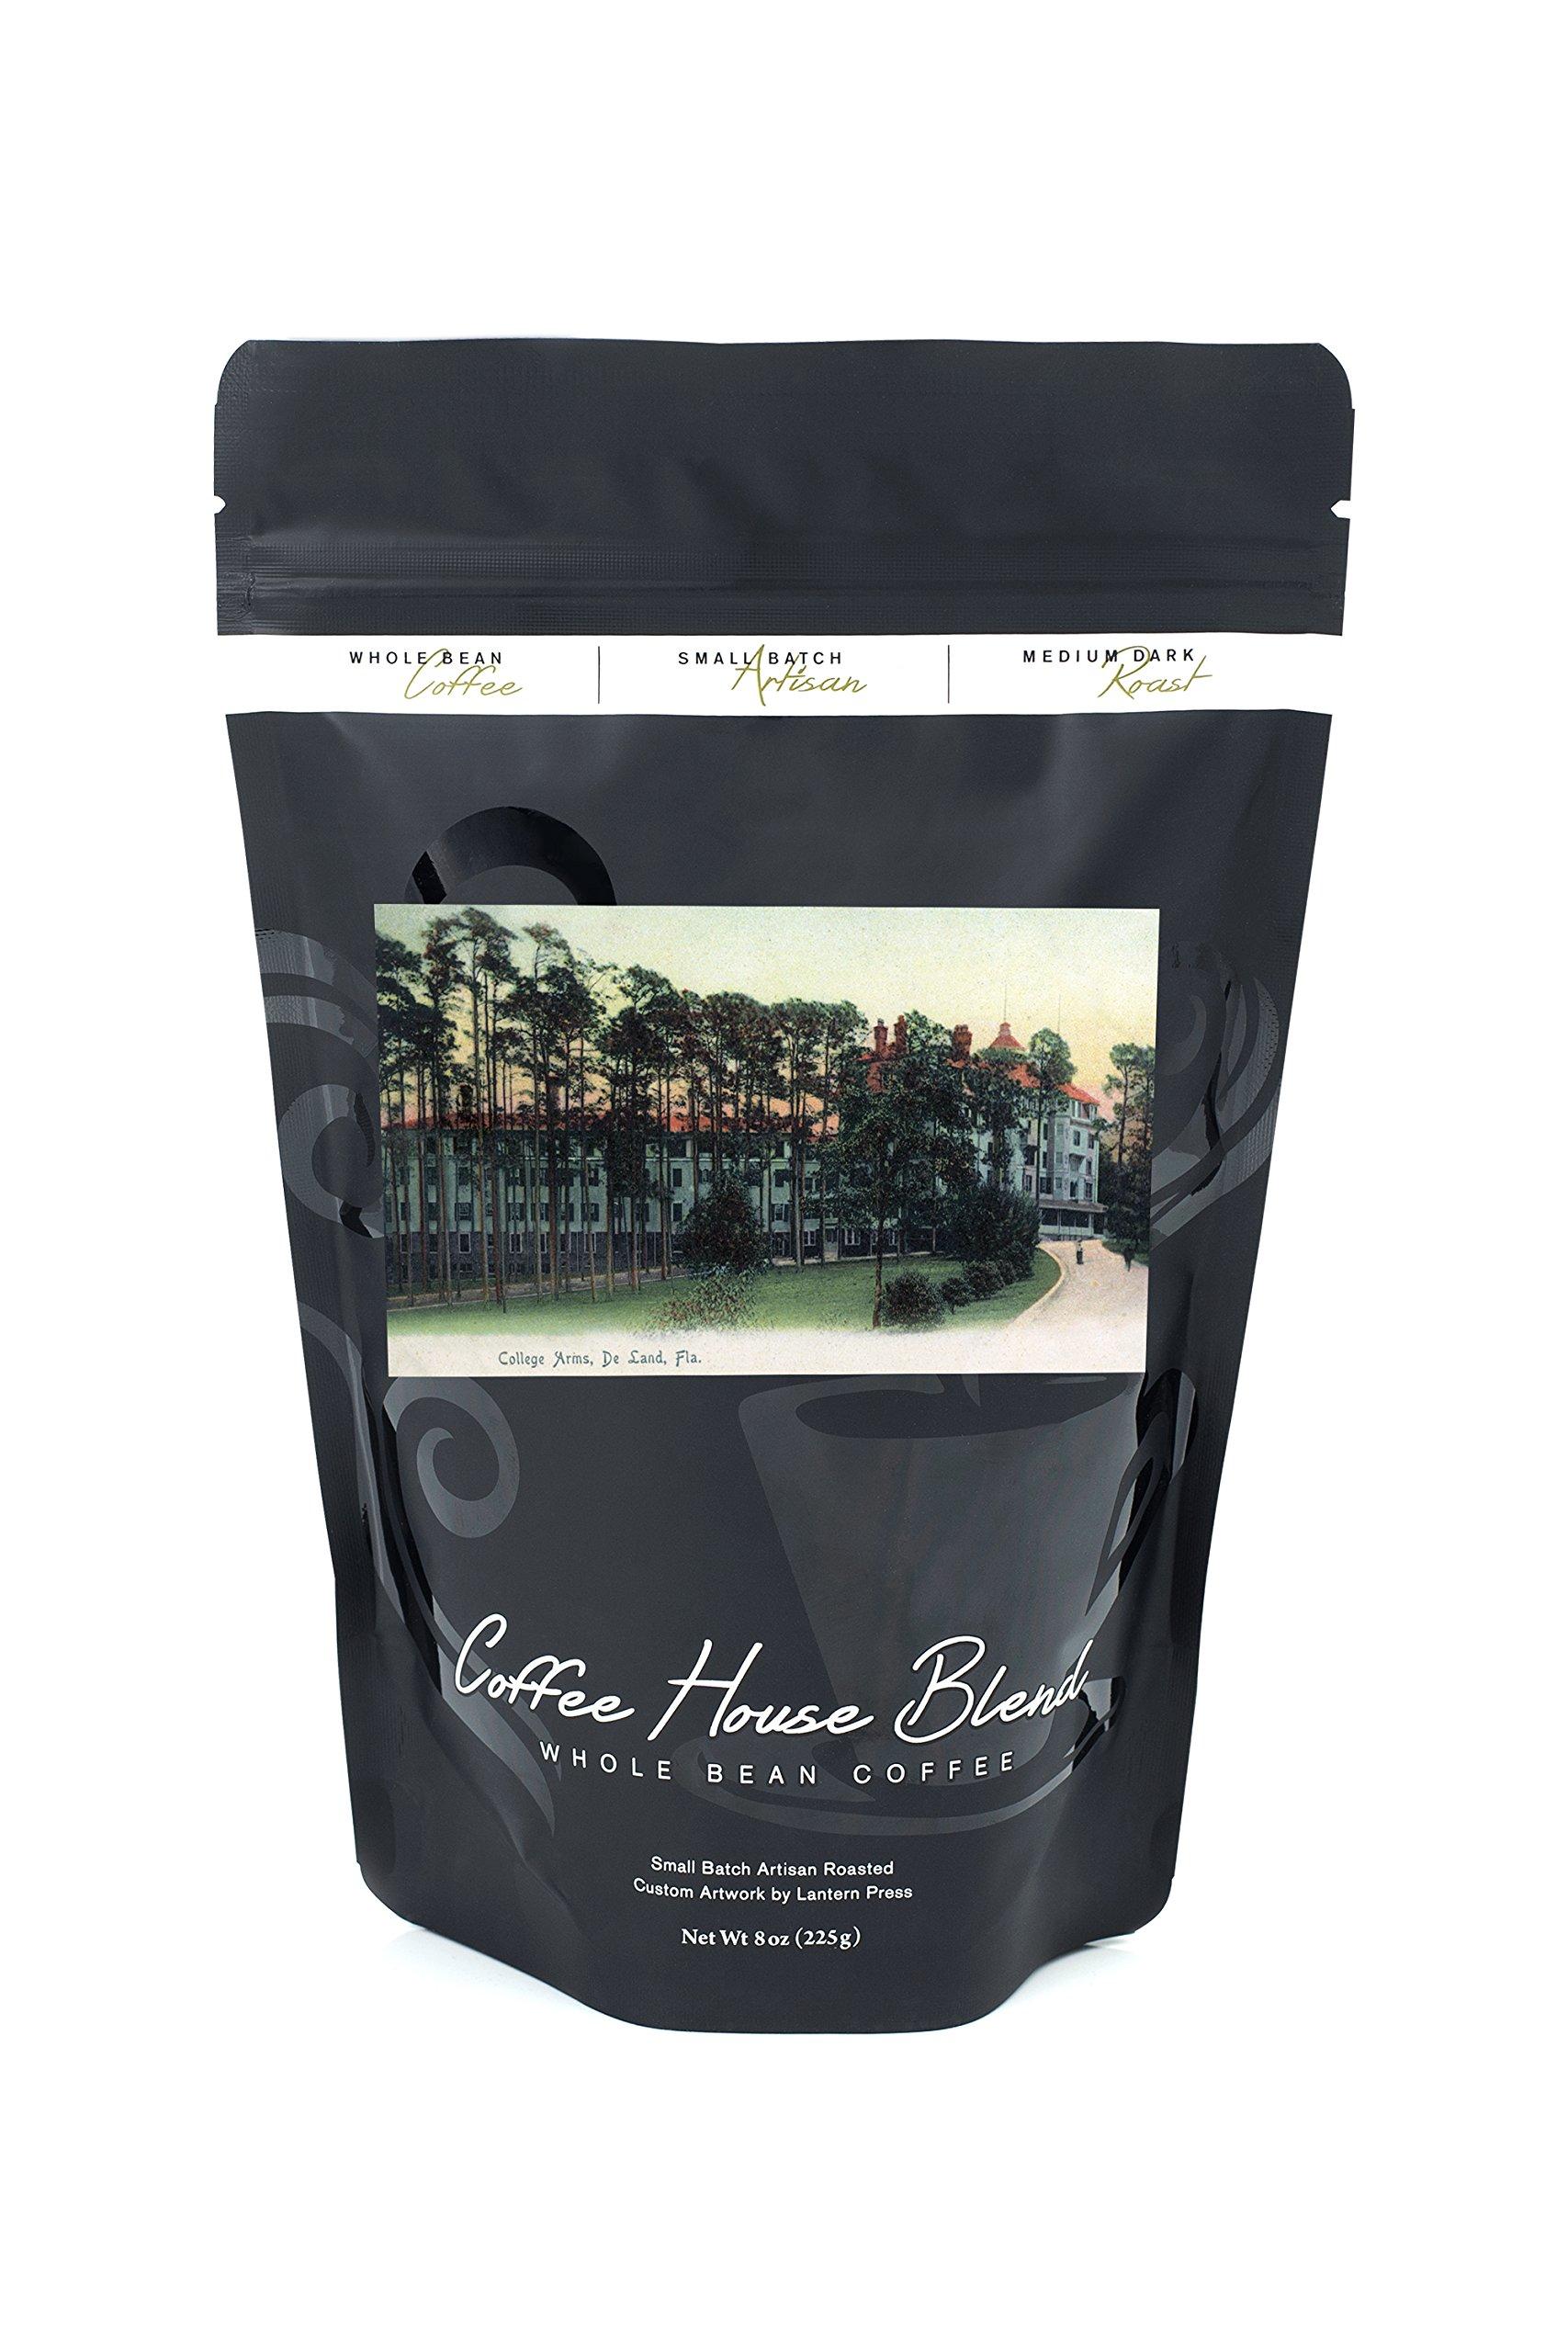 Deland, Florida - College Arms Exterior View (8oz Whole Bean Small Batch Artisan Coffee - Bold & Strong Medium Dark Roast w/Artwork) by Lantern Press (Image #1)